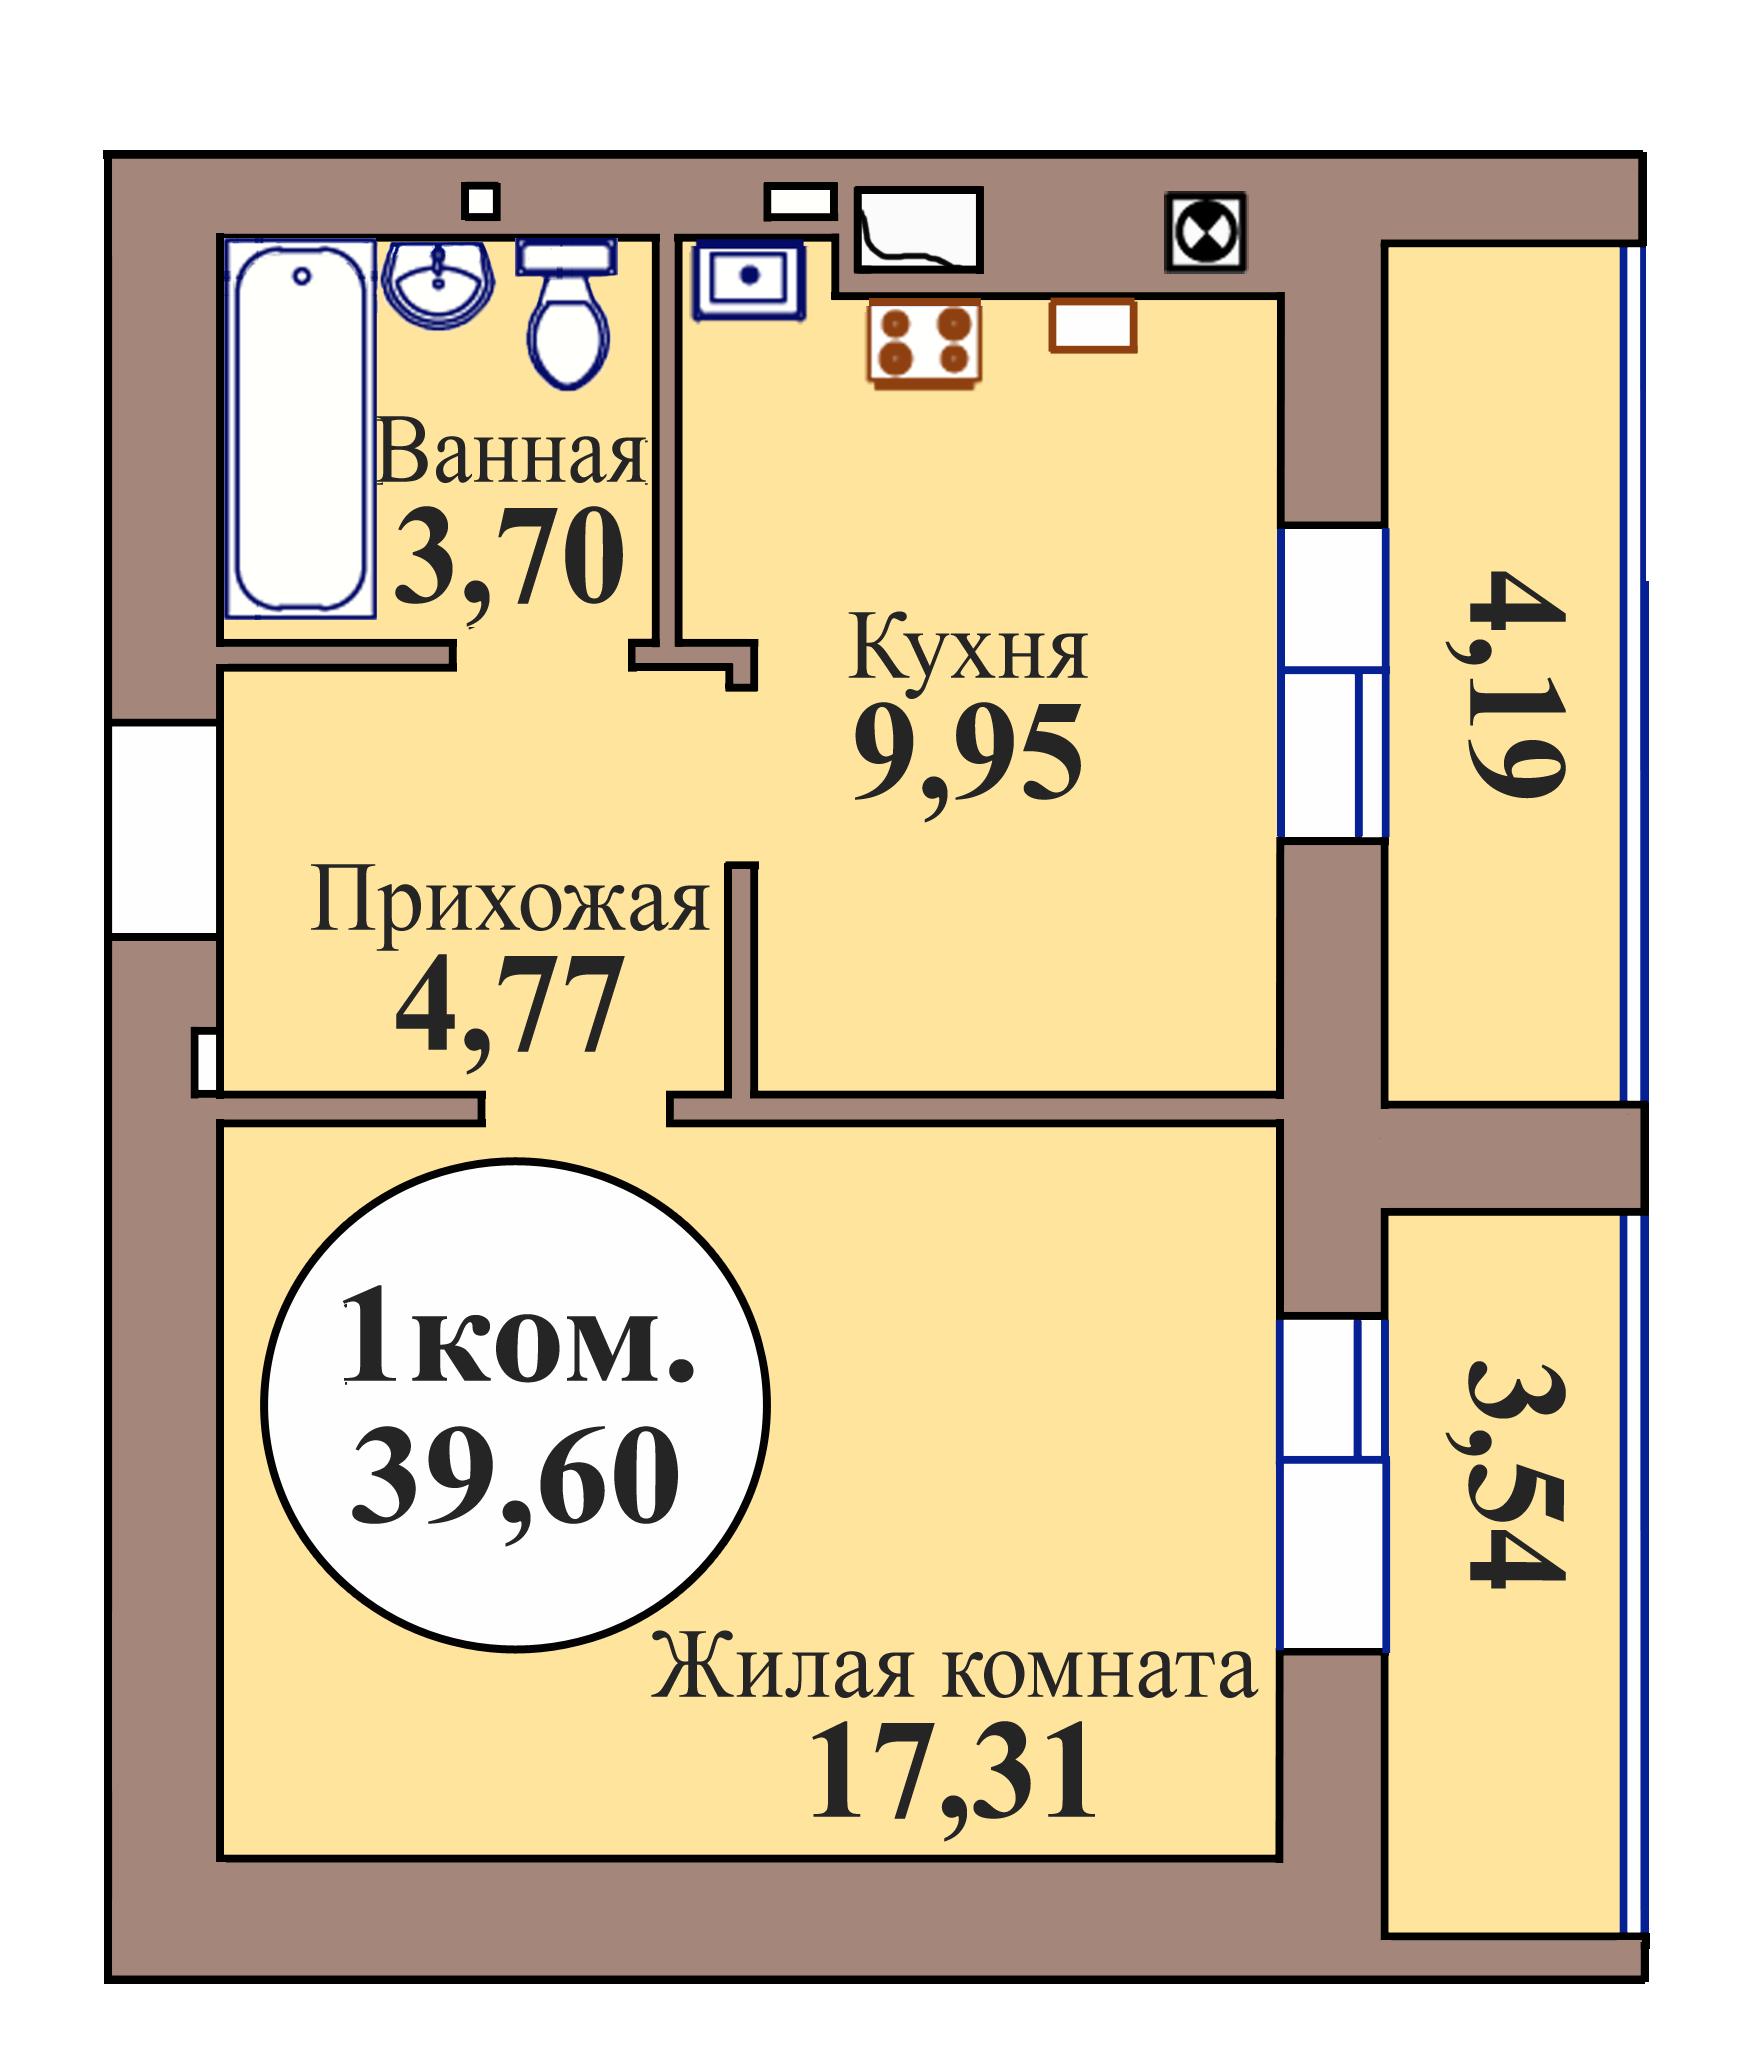 1-комн. кв. по пер. Калининградский, 5 кв. 81 в Калининграде